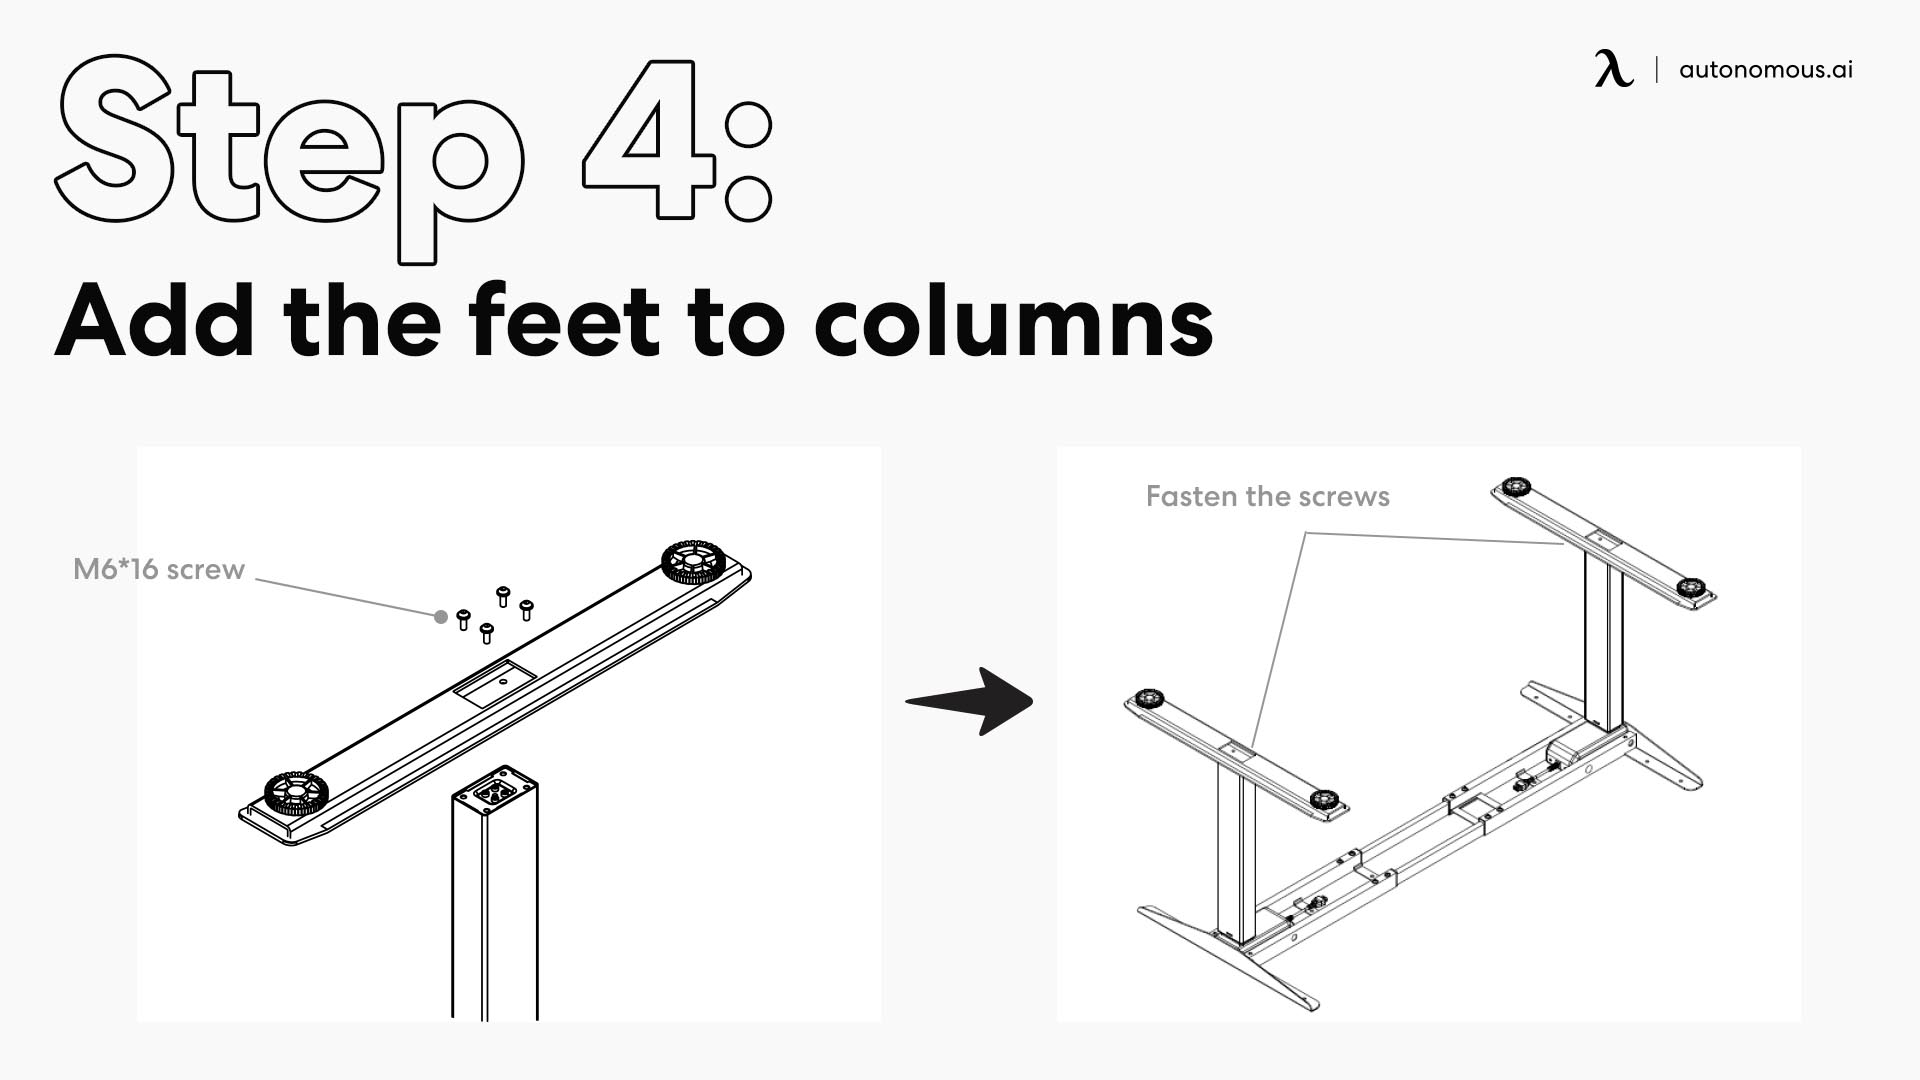 Add the feet to columns